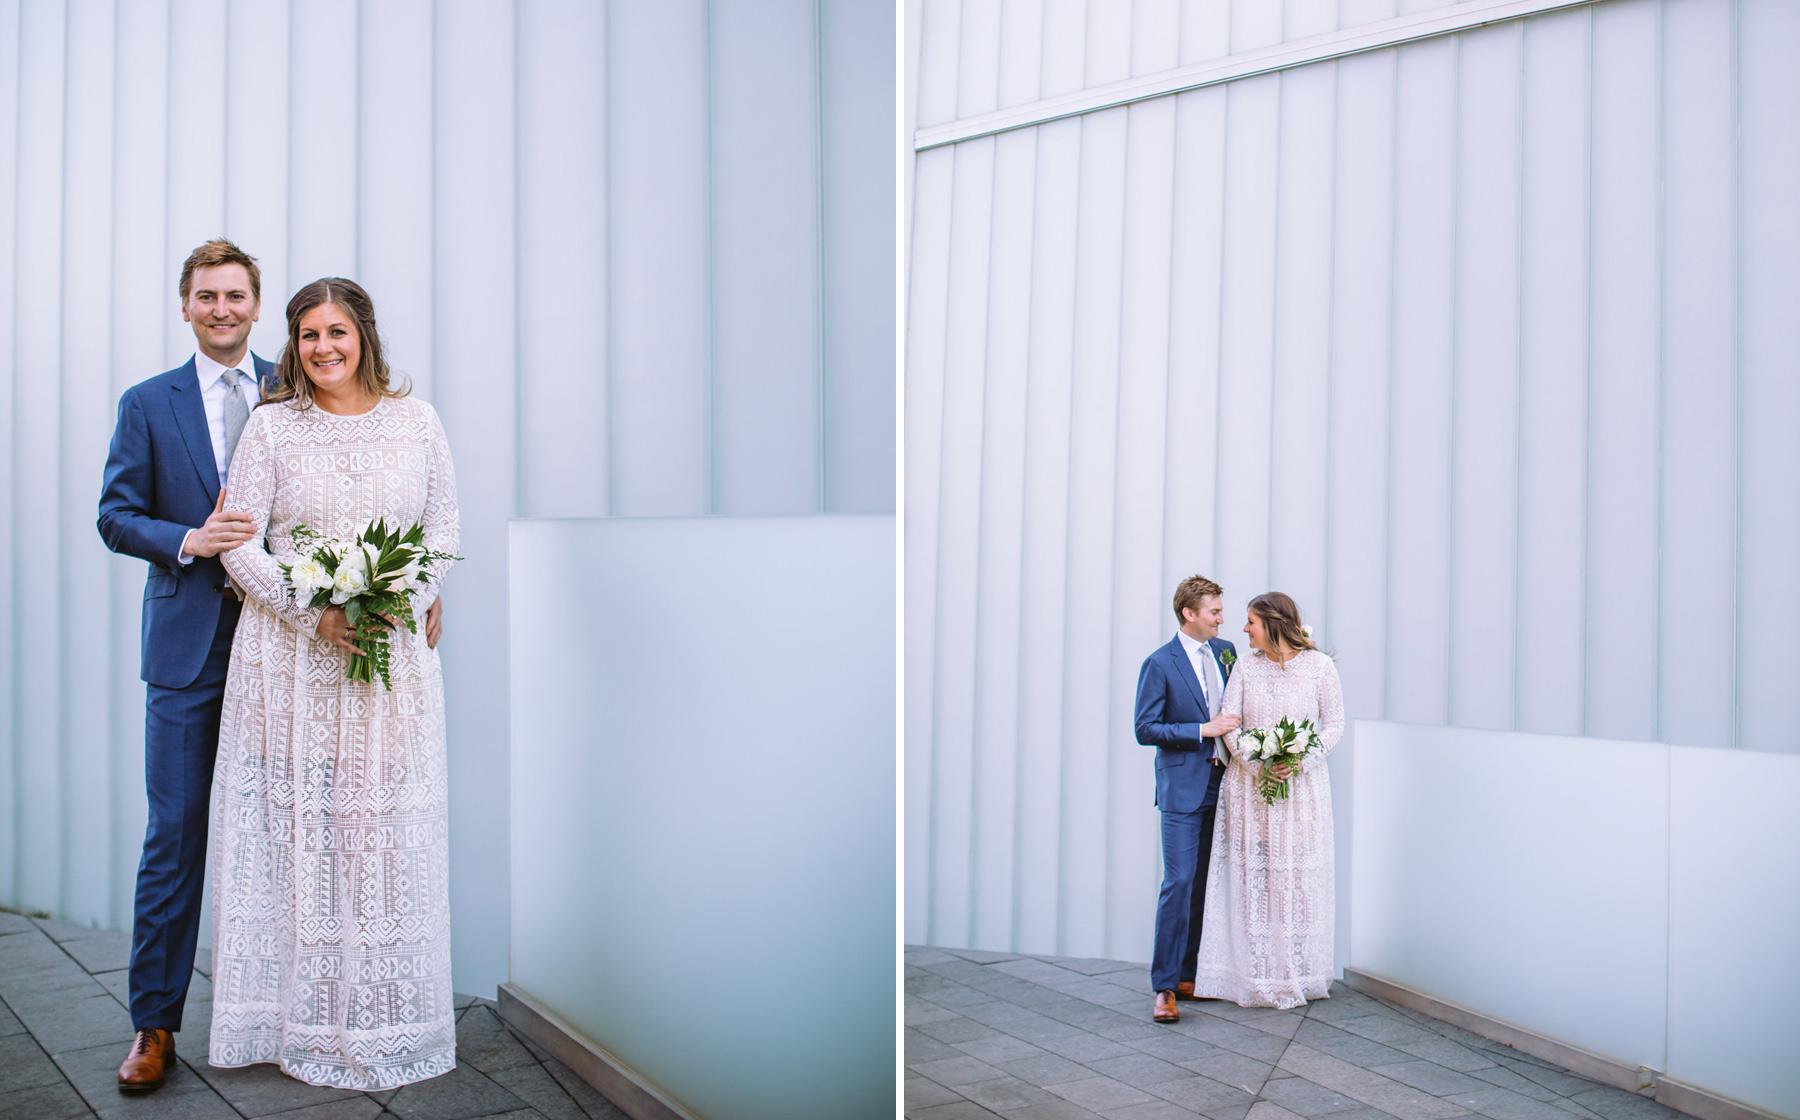 Pete + Susannah The Guild Kansas City Bohemian Outdoor Wedding _Kindling Wedding Photography - 21.JPG